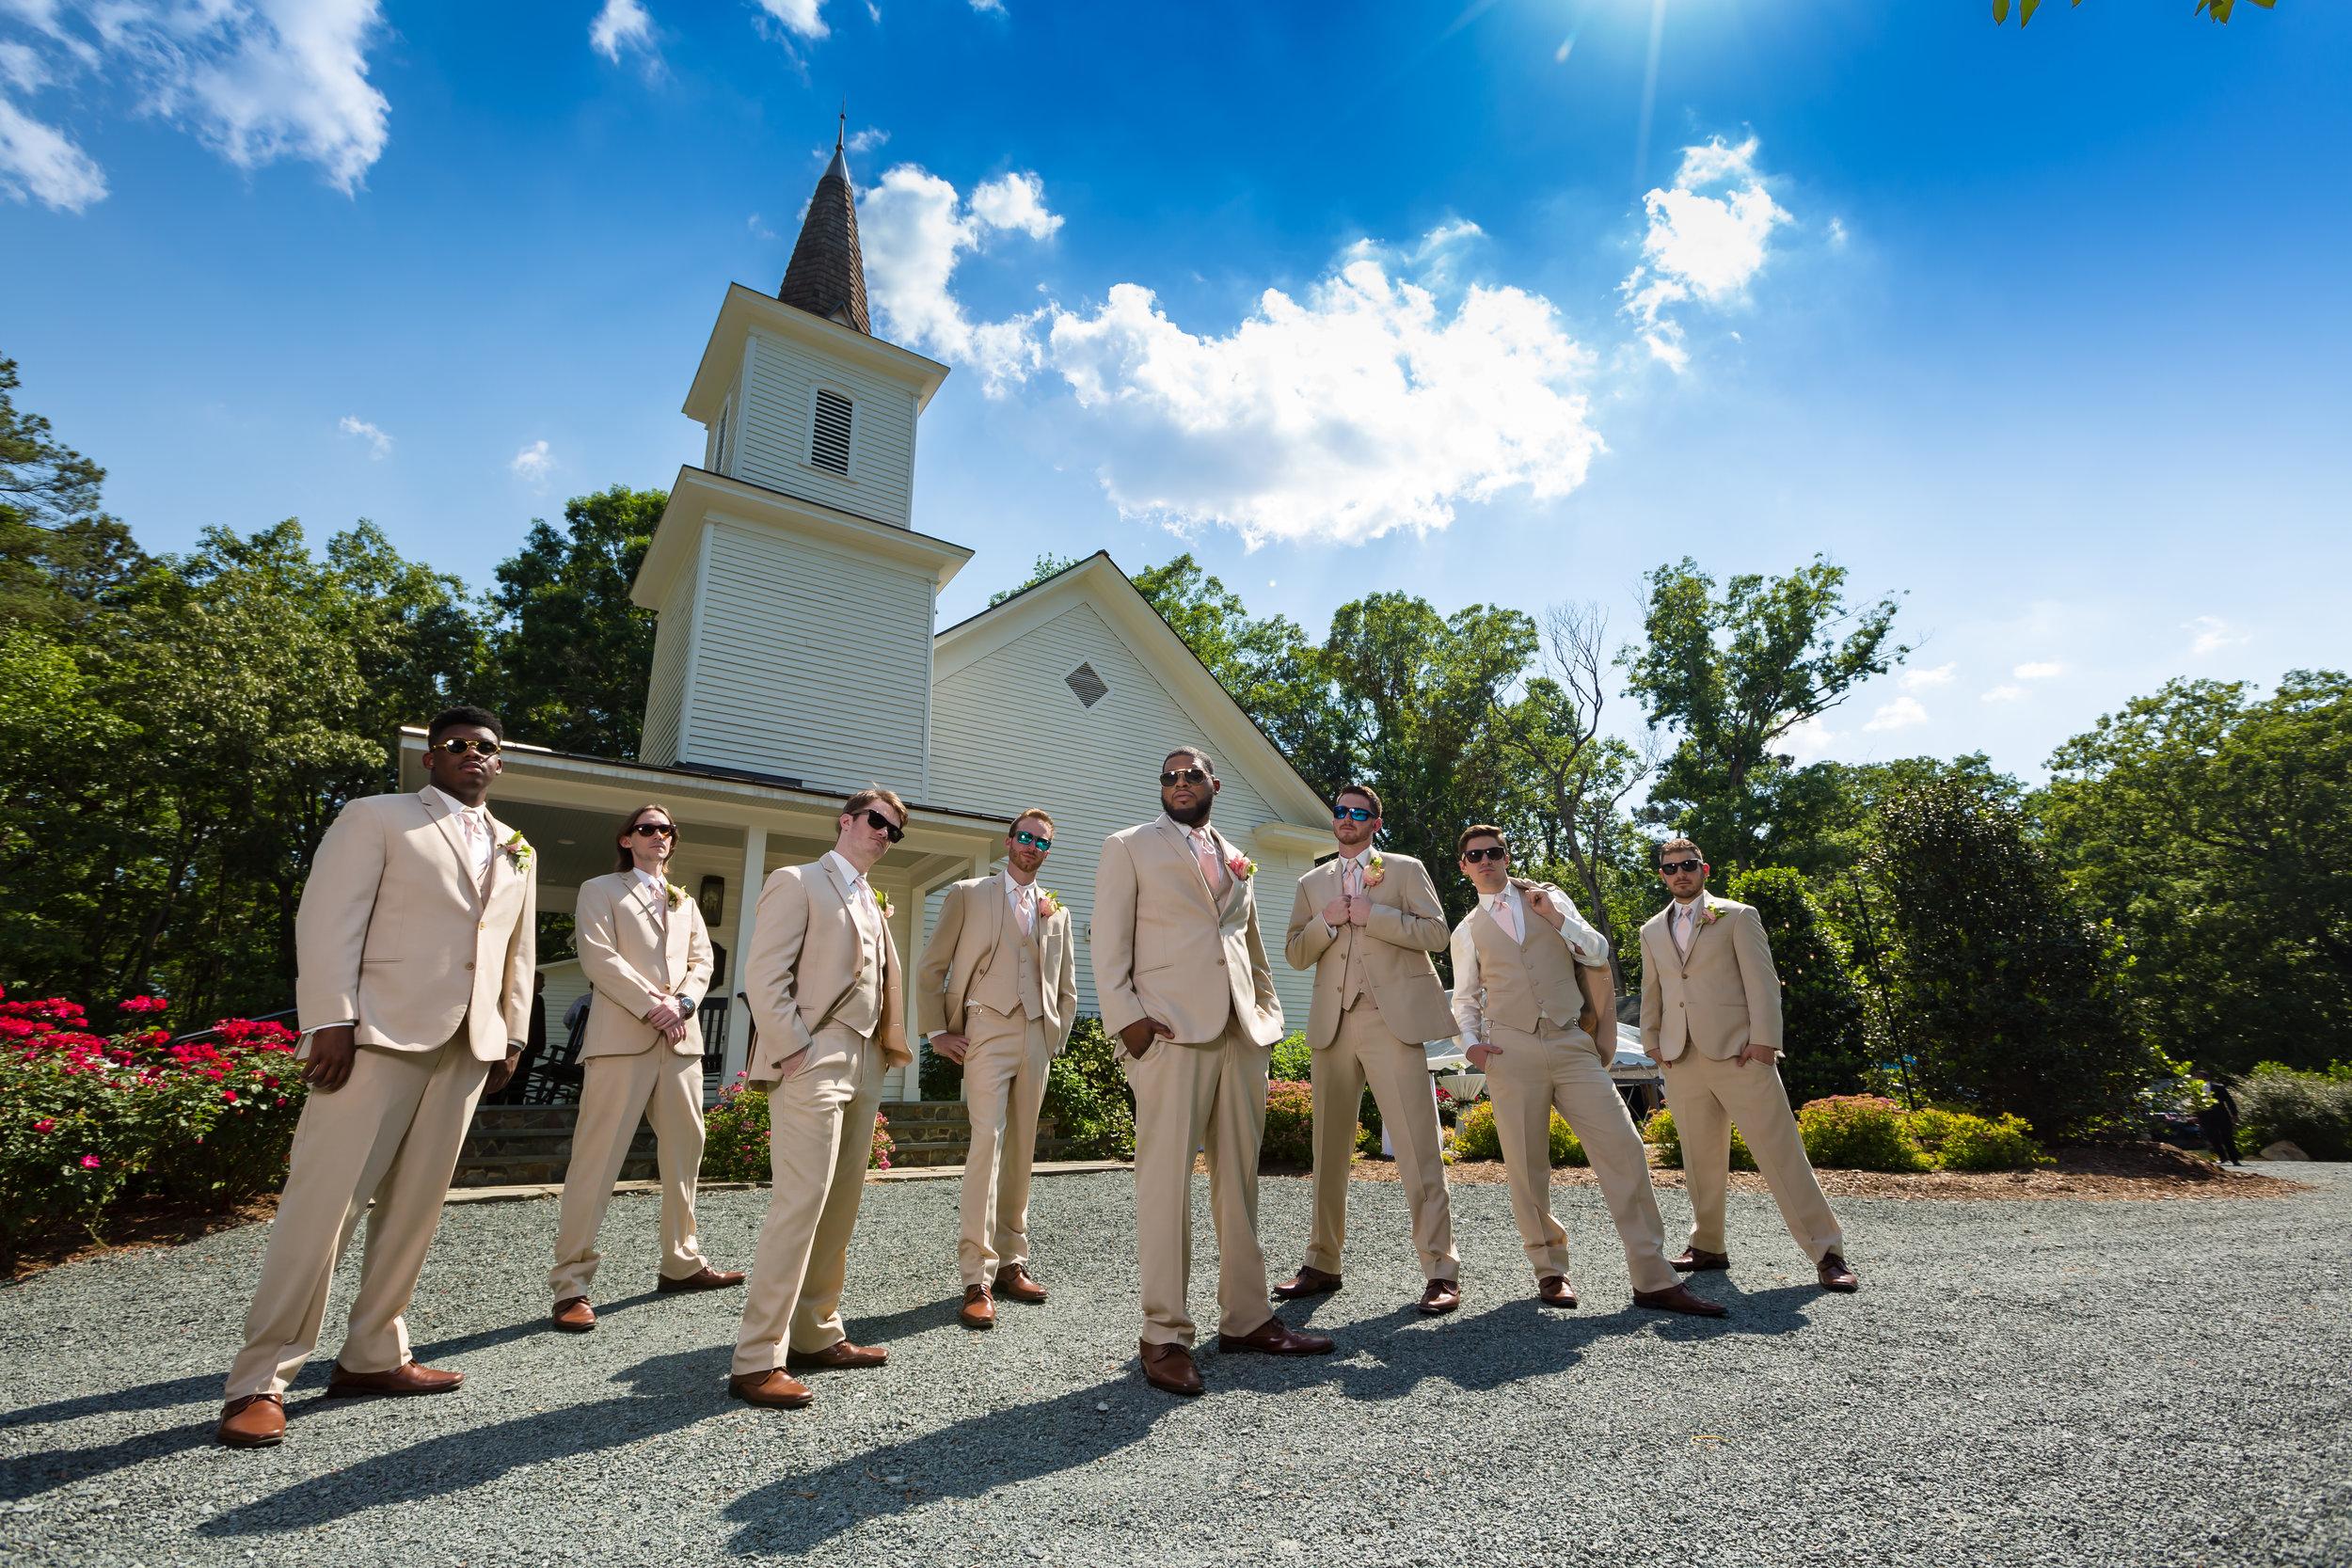 sarah_ikeem_wedding_at_the_parlour_at_manns_chapel_05.18.19-0729.jpg